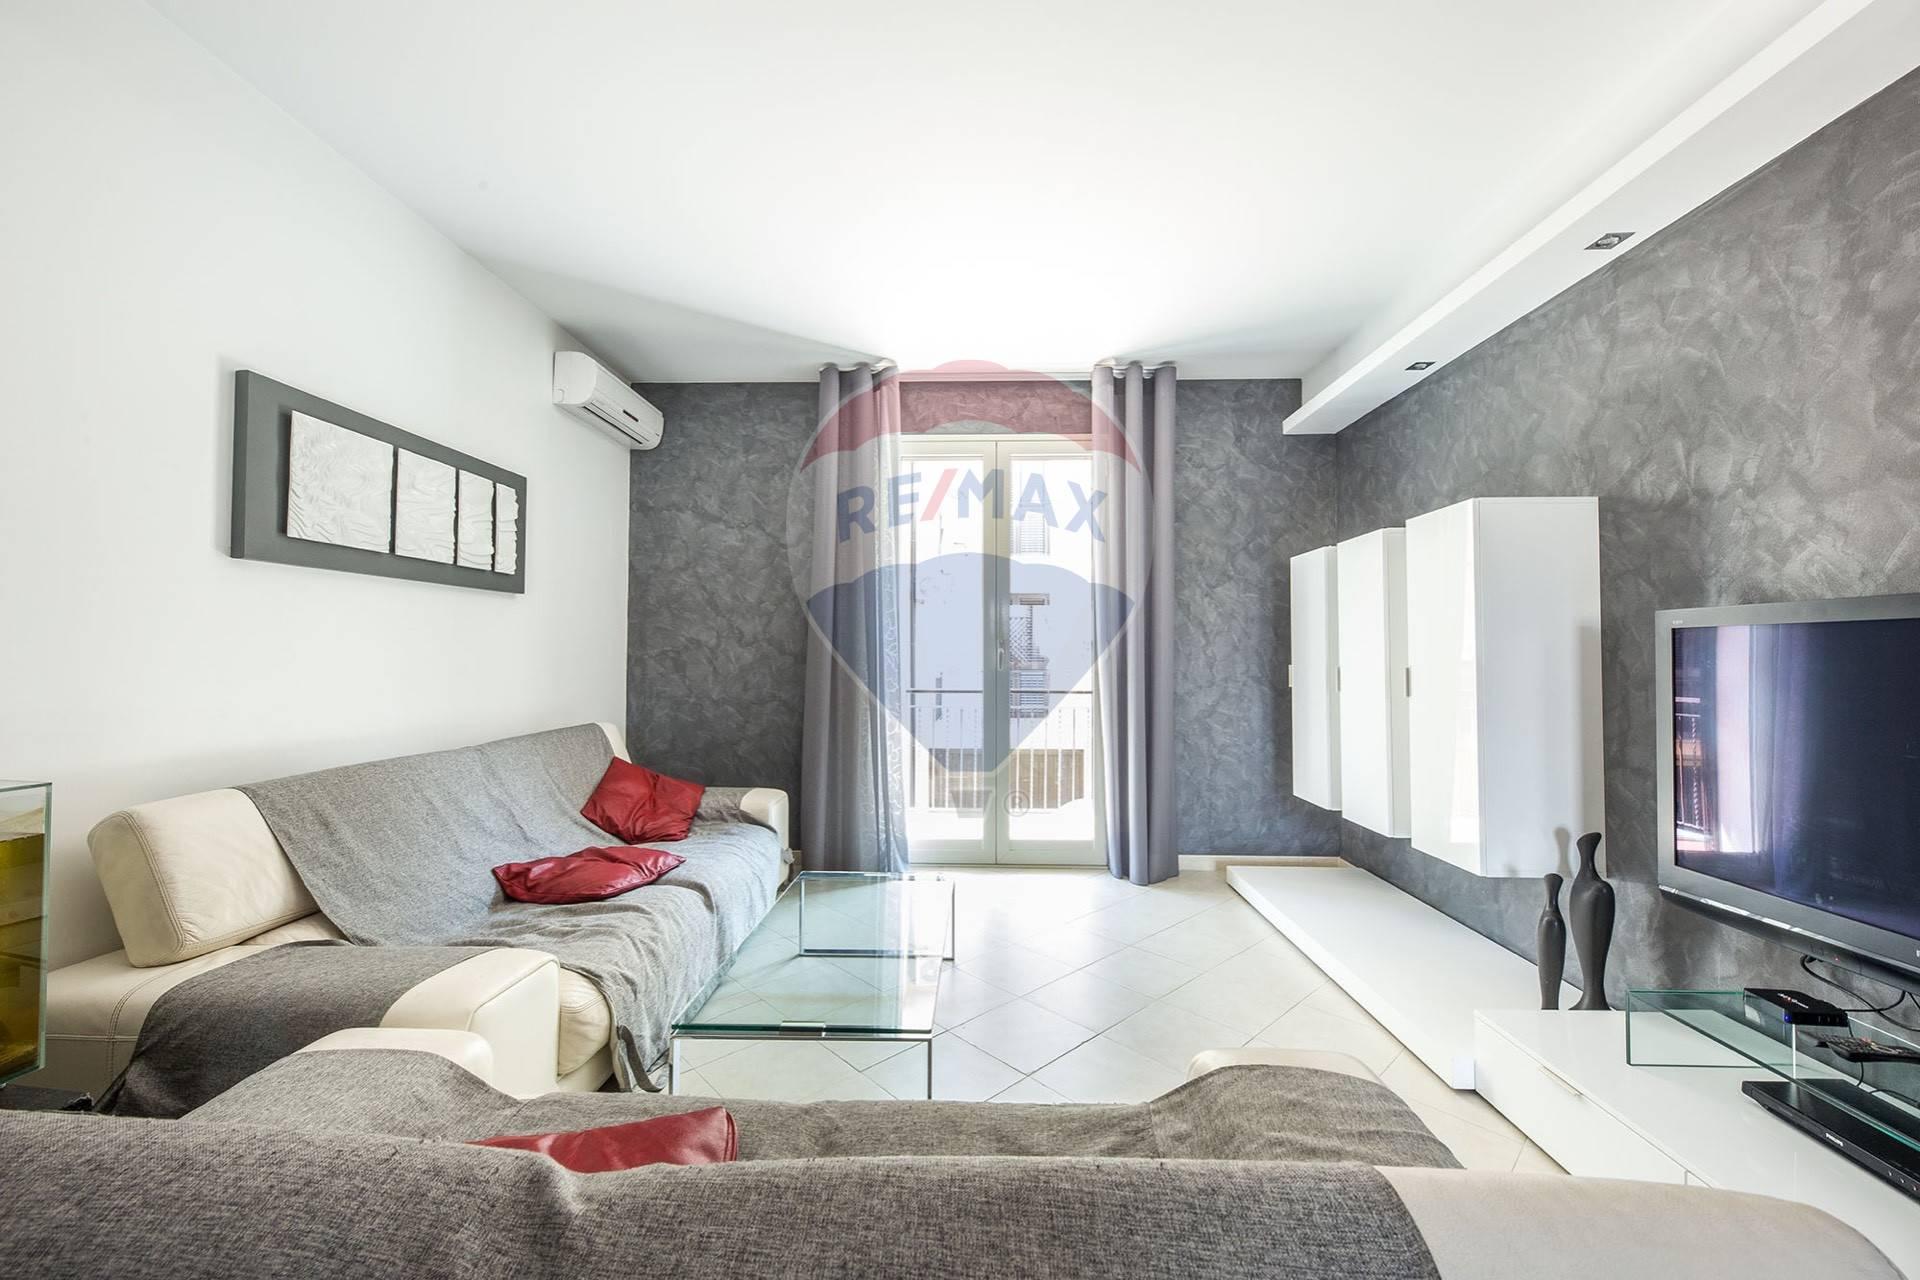 belpasso vendita quart: piano tavola re/max city home